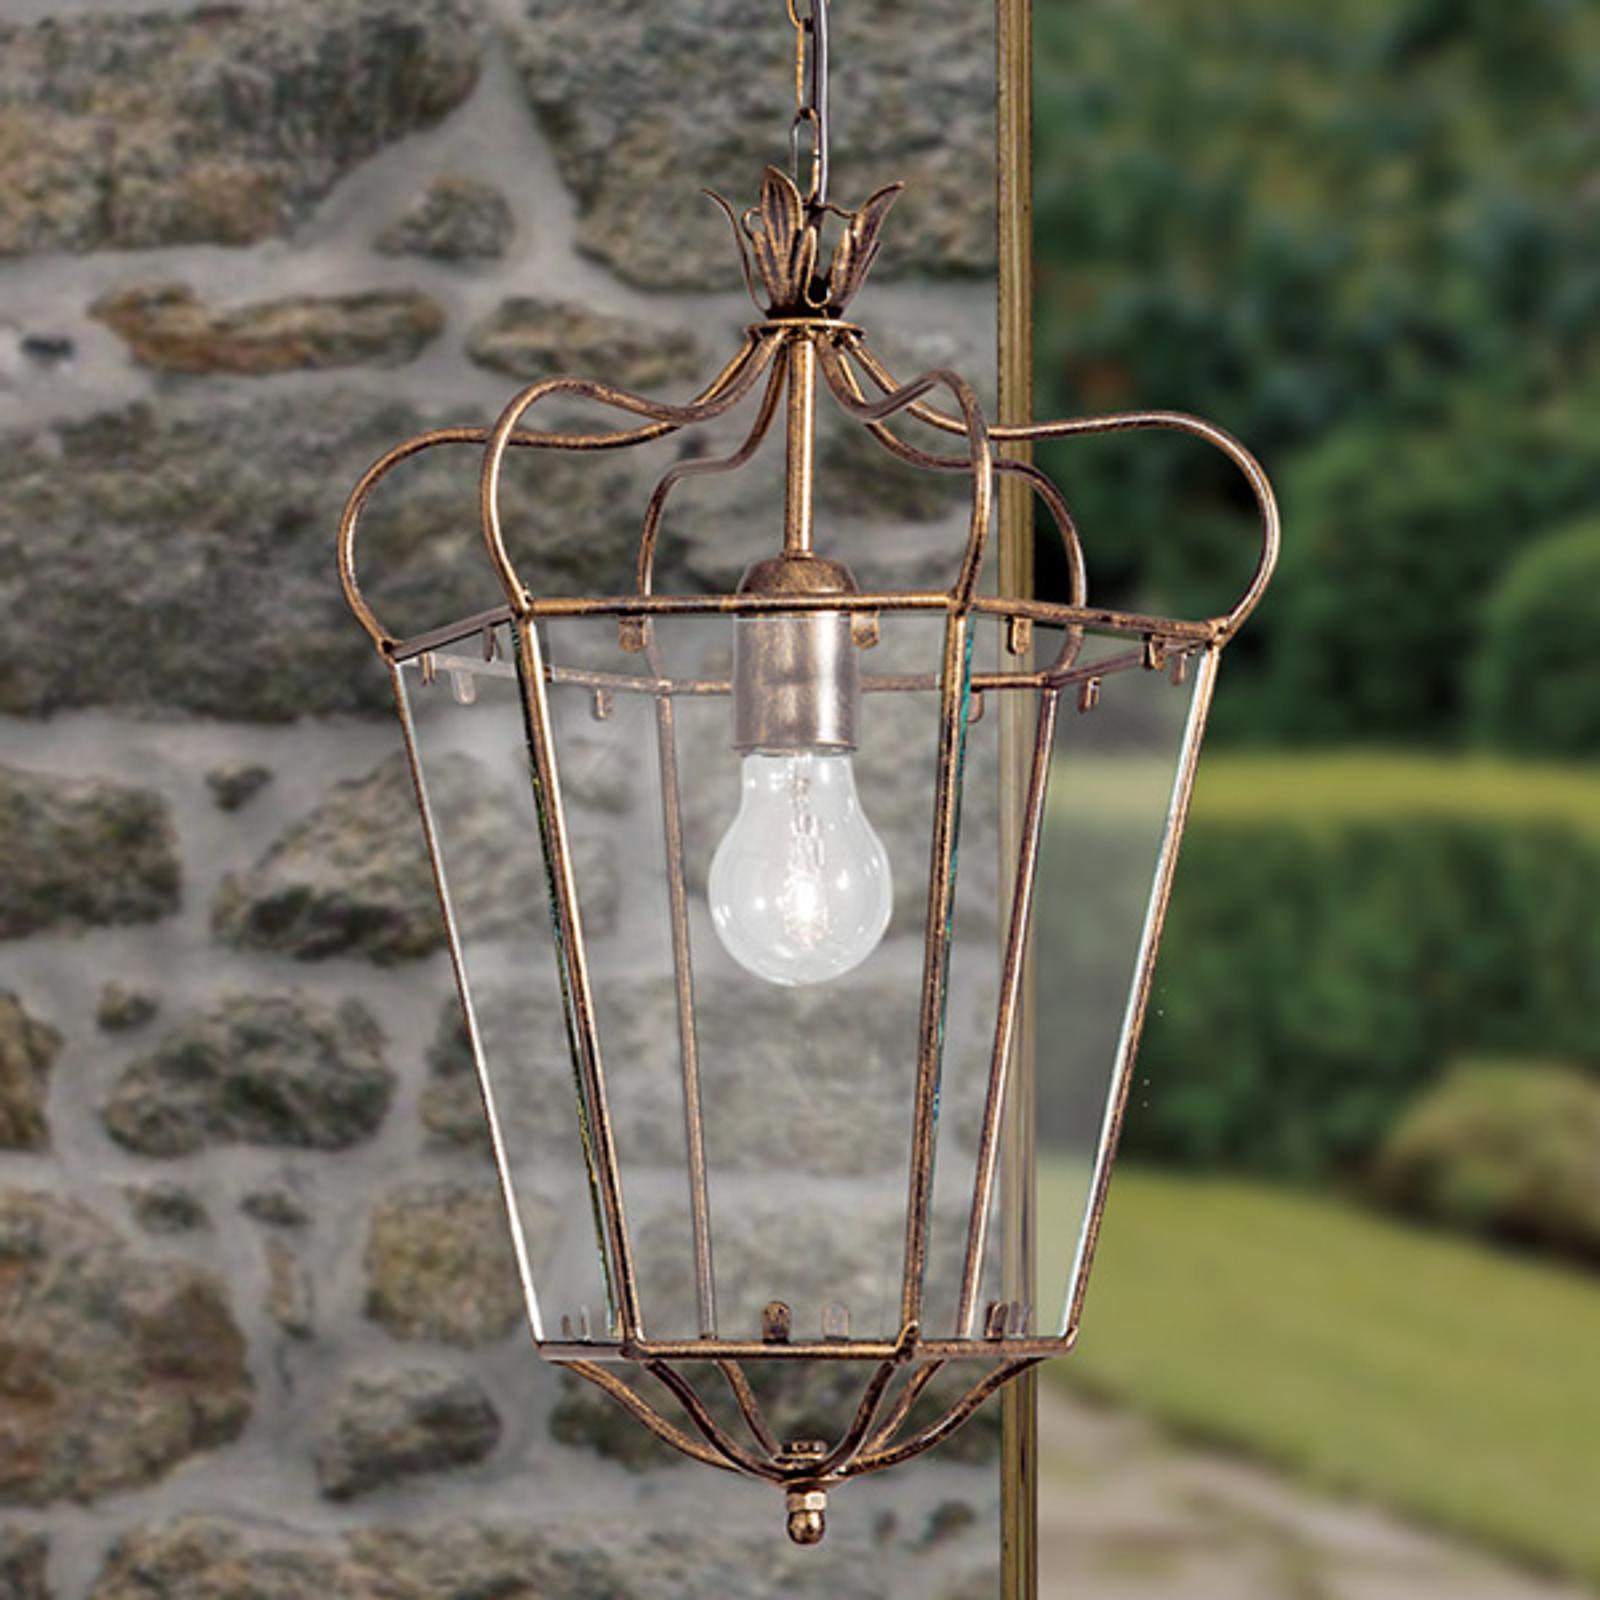 Superbe suspension FALOTTA style lanterne, 1 lampe